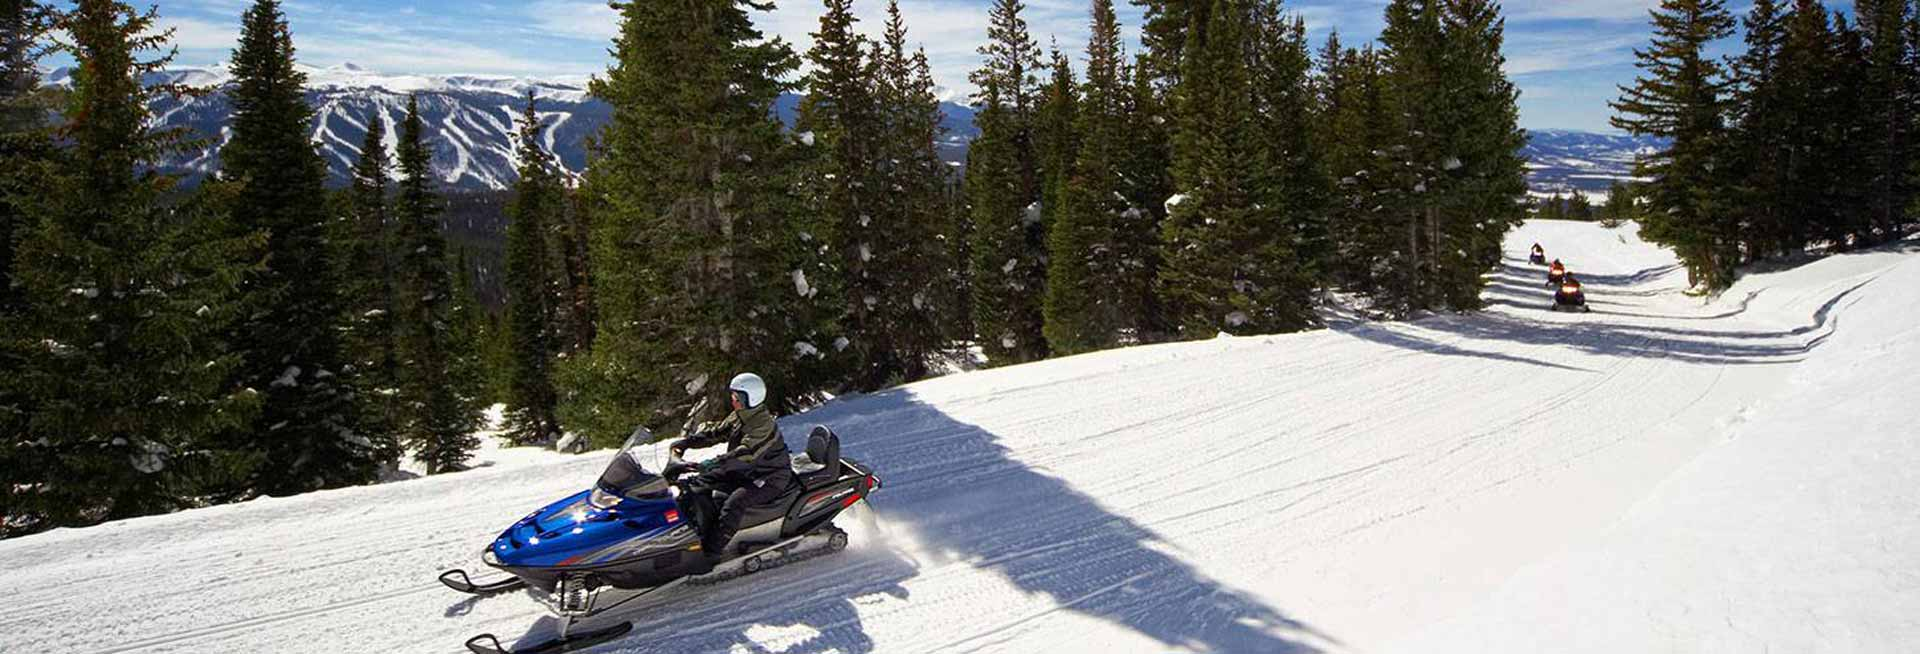 Snowmobiler on trail.